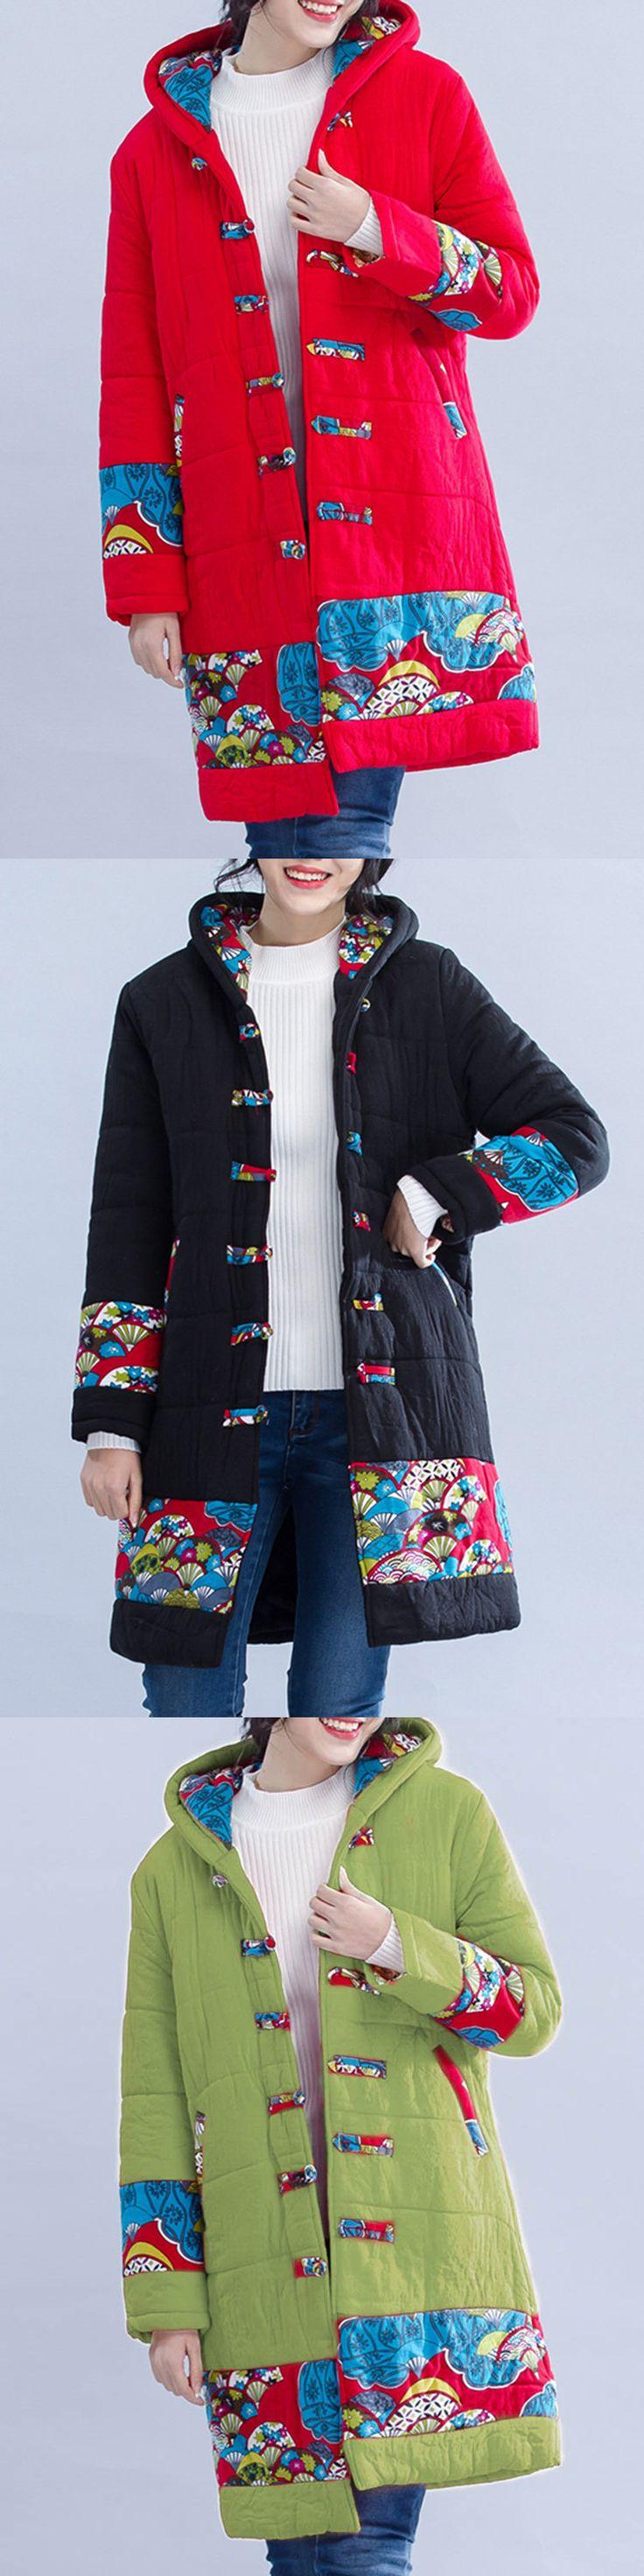 O-NEWE Vintage Printed Chinese Frog Long Sleeve Hooded Coat #fashion #style #coat #winter